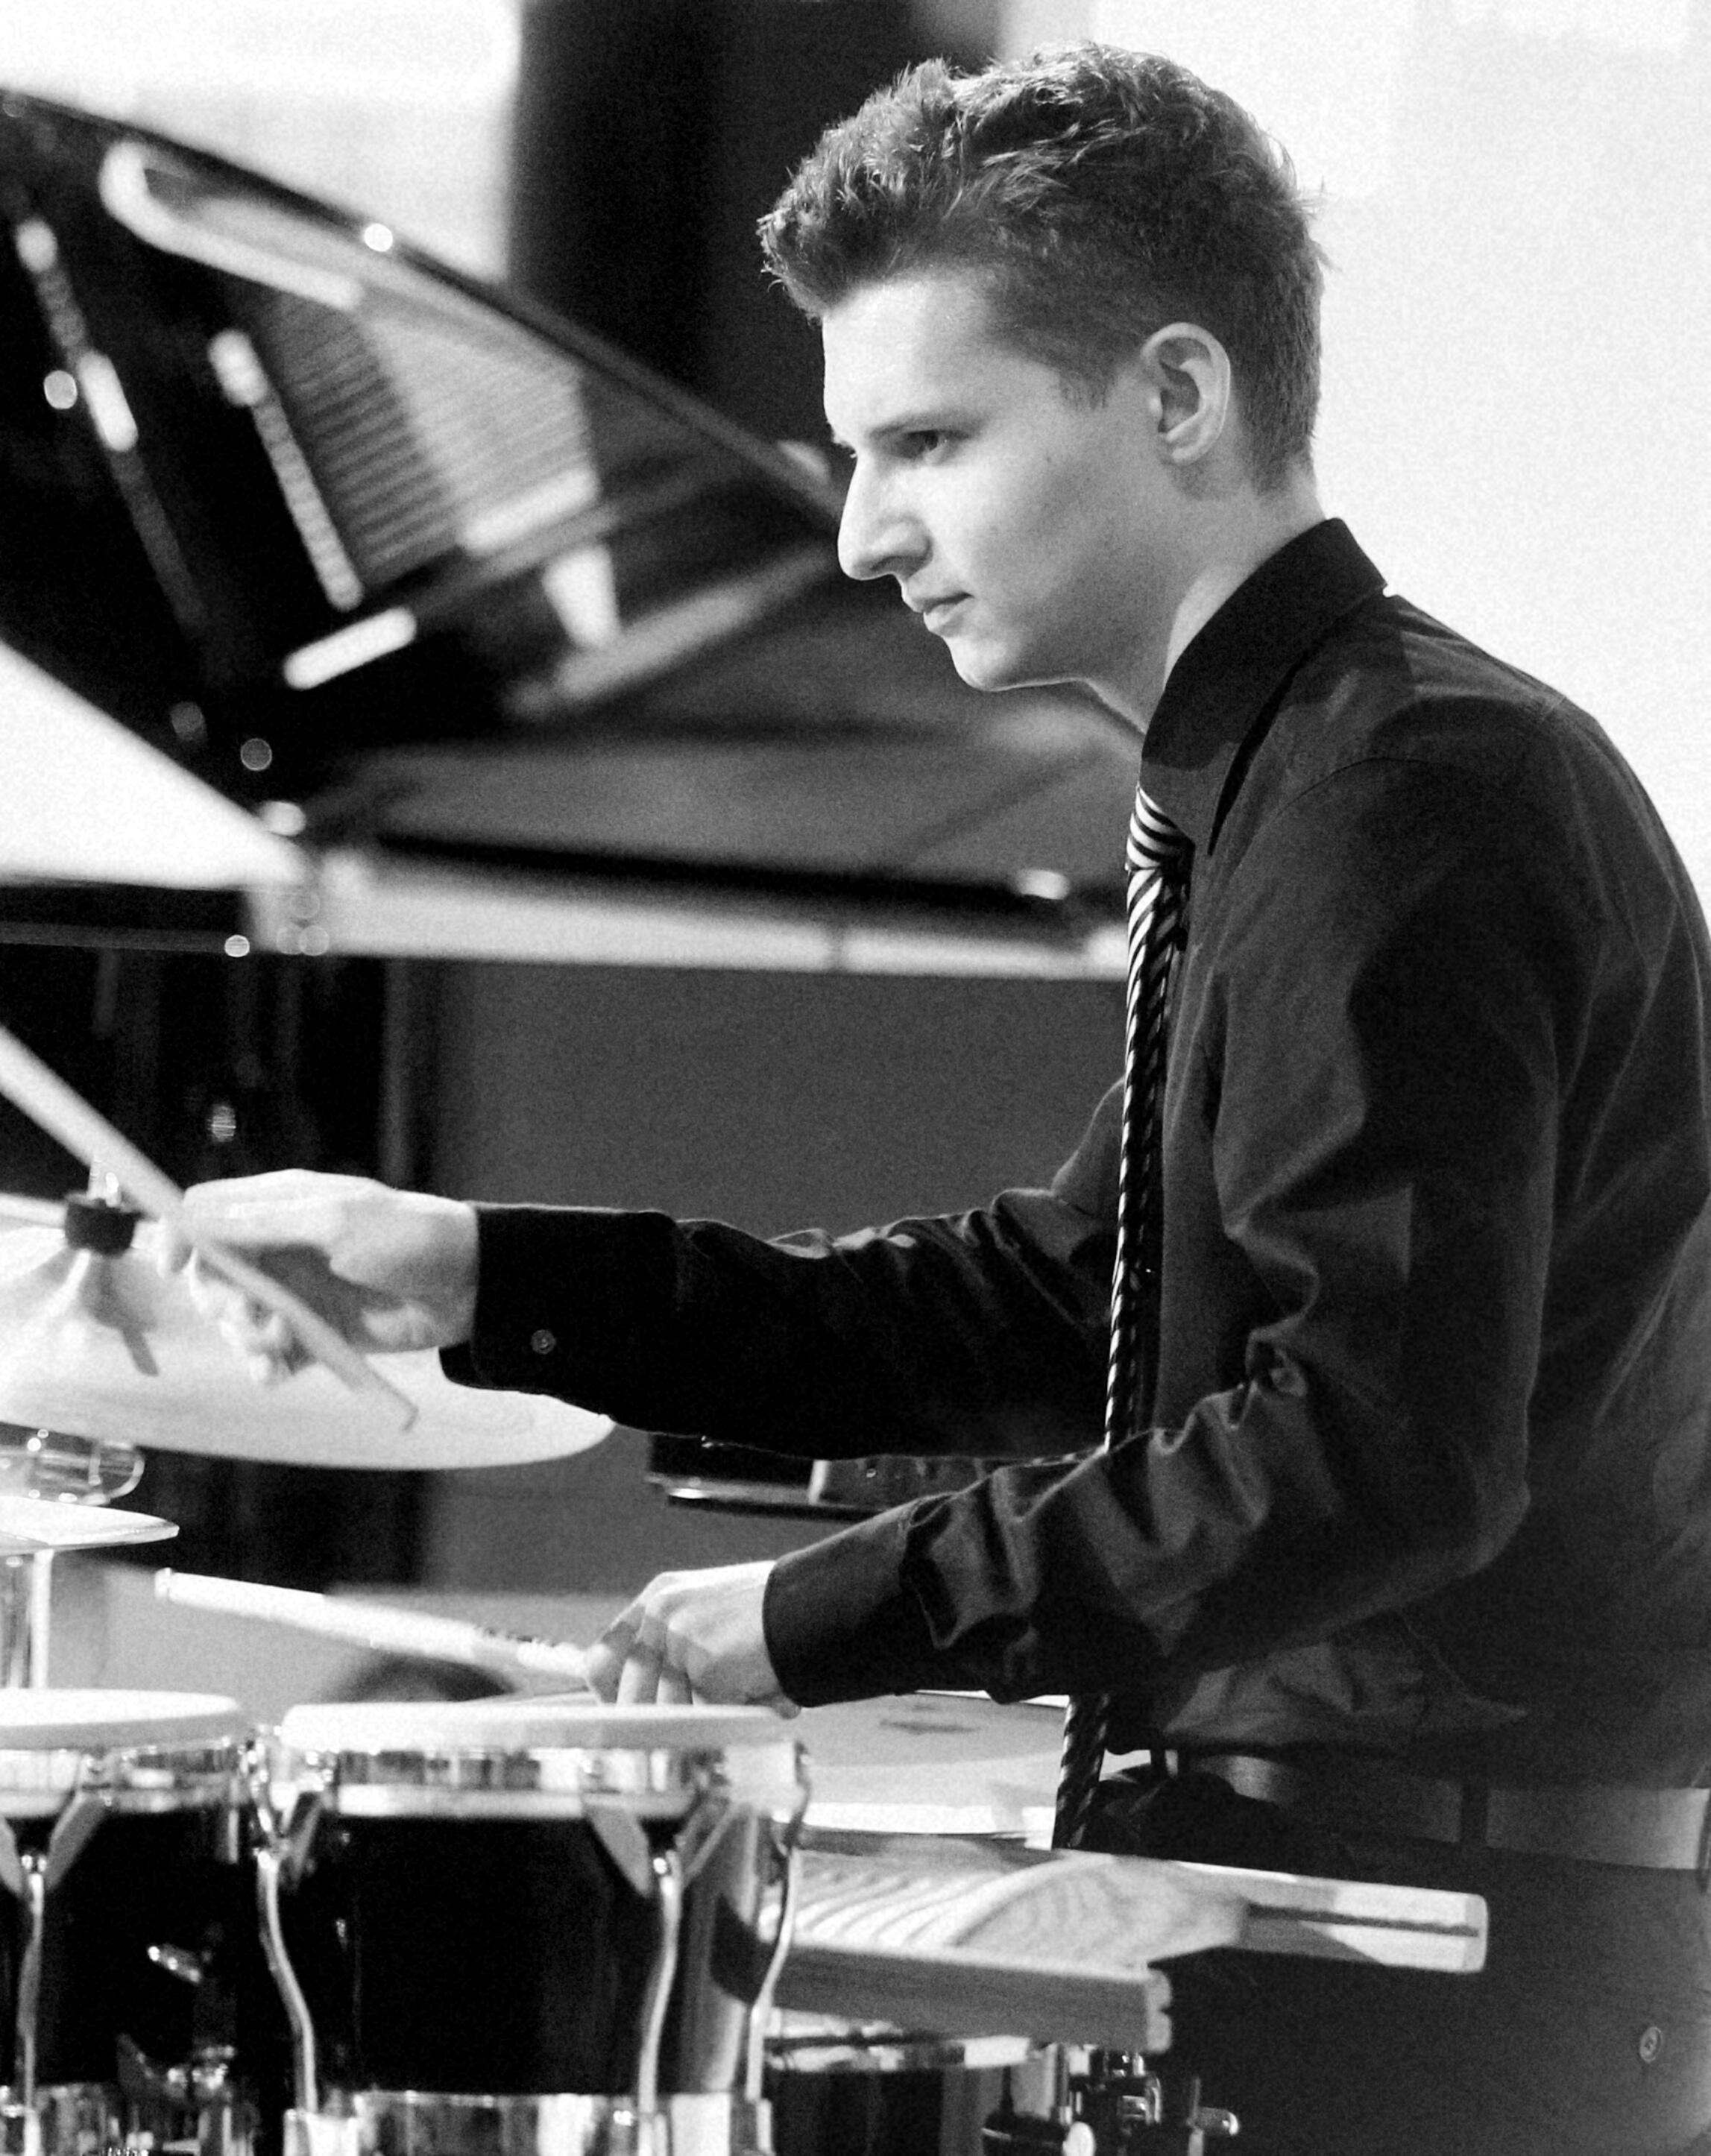 Robin Klopfer